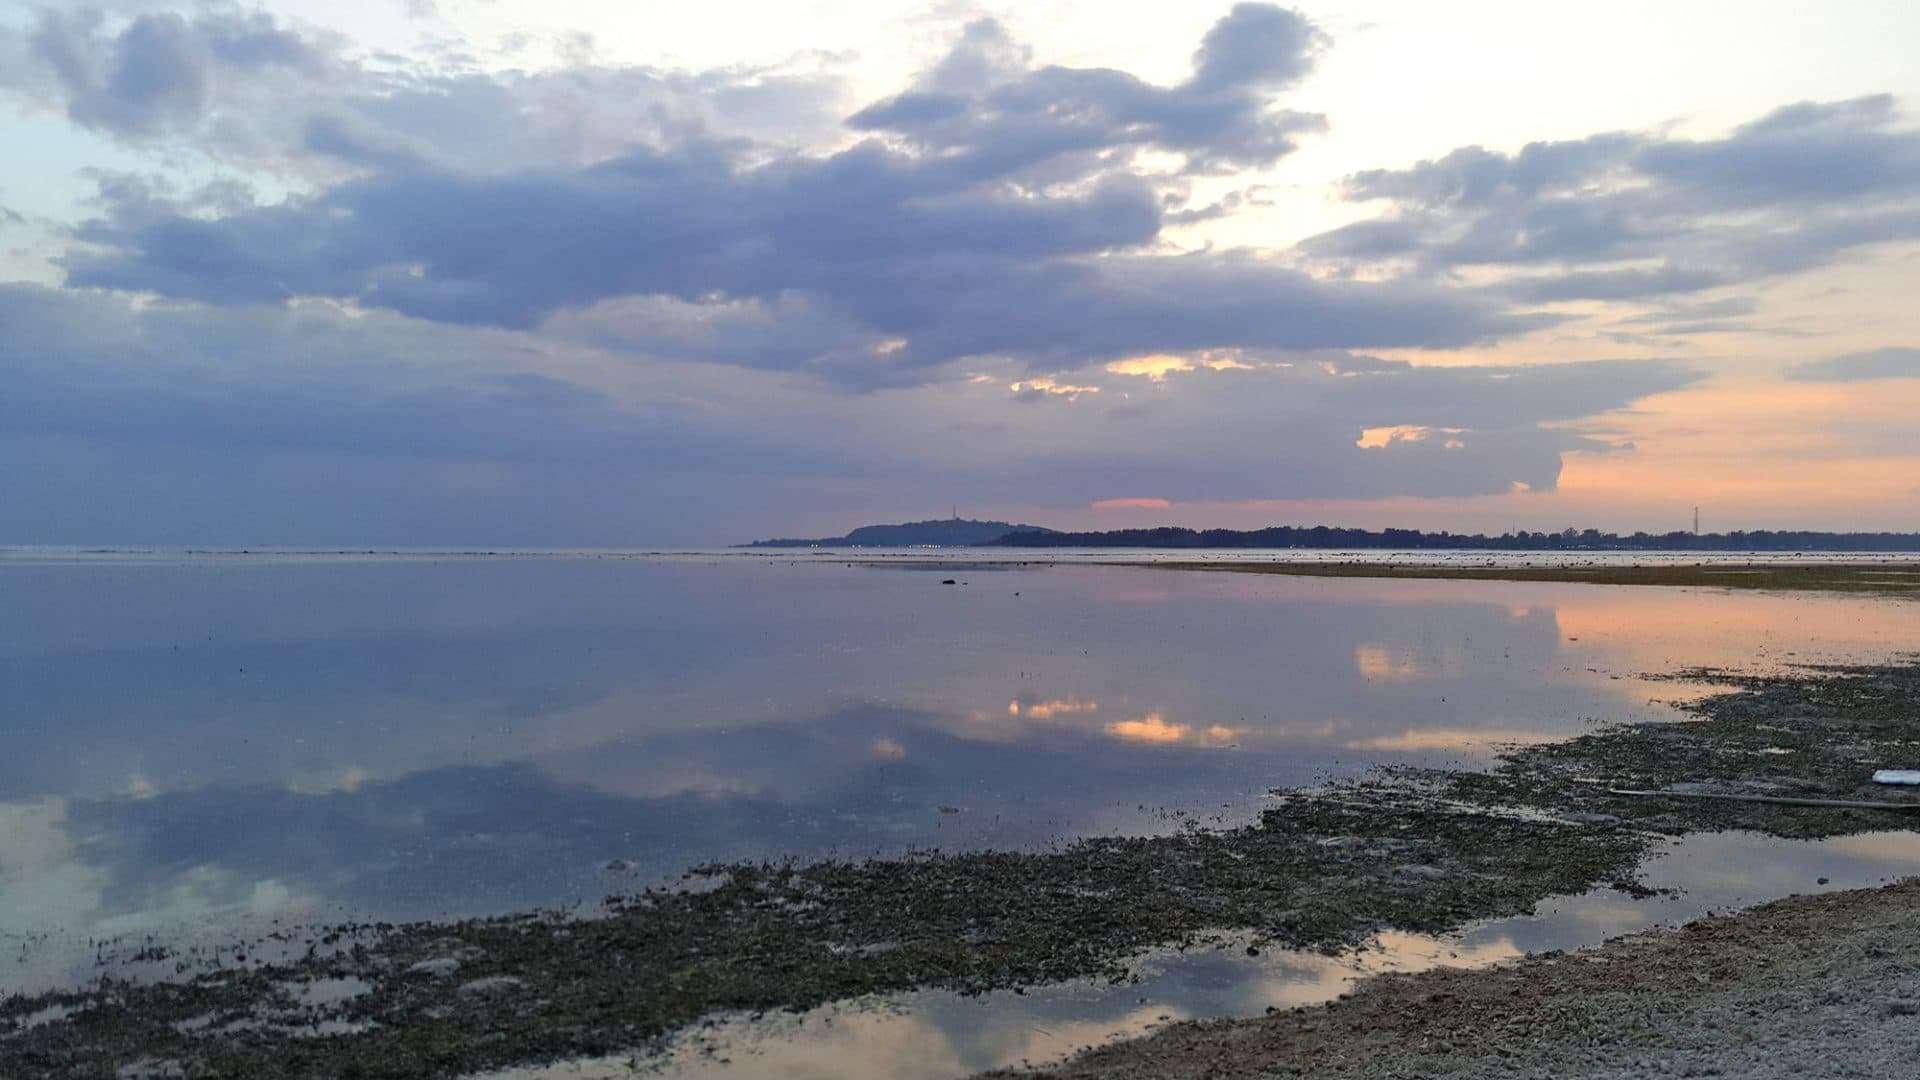 marea_bassa_isole_gili_air